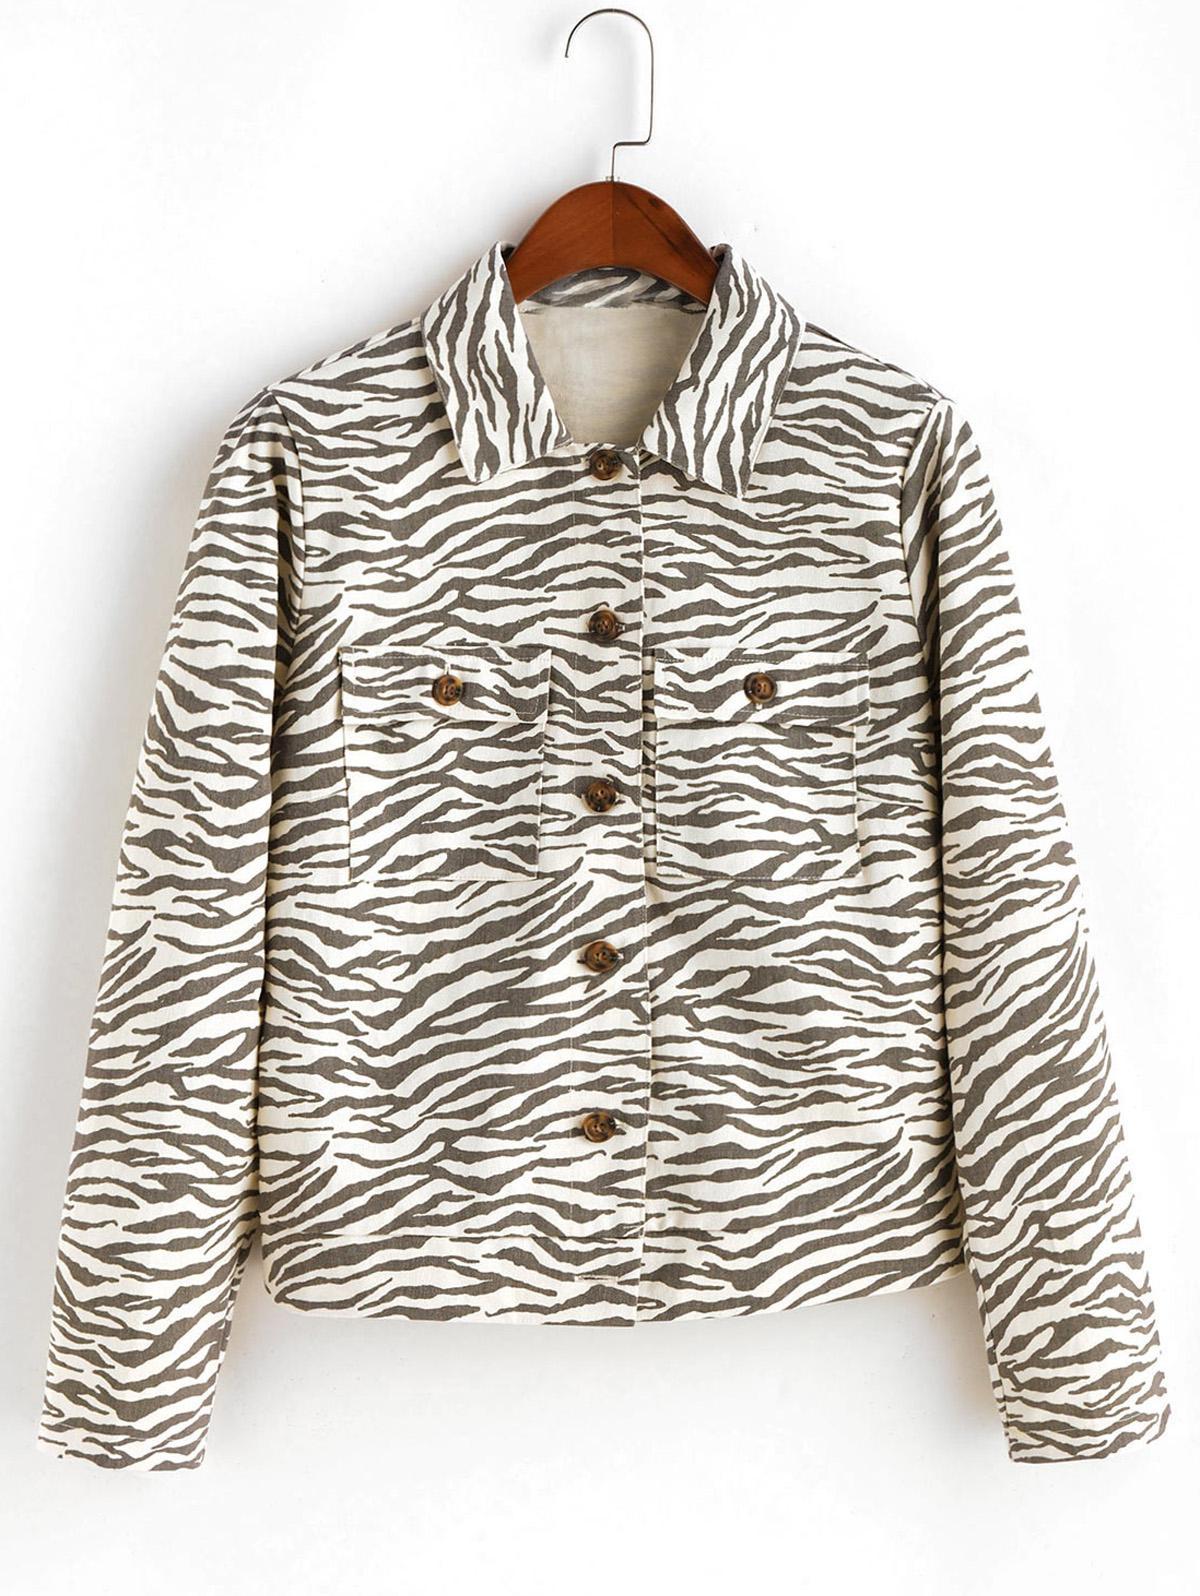 ZAFUL Button Up Flap Pockets Zebra Print Shirt Jacket